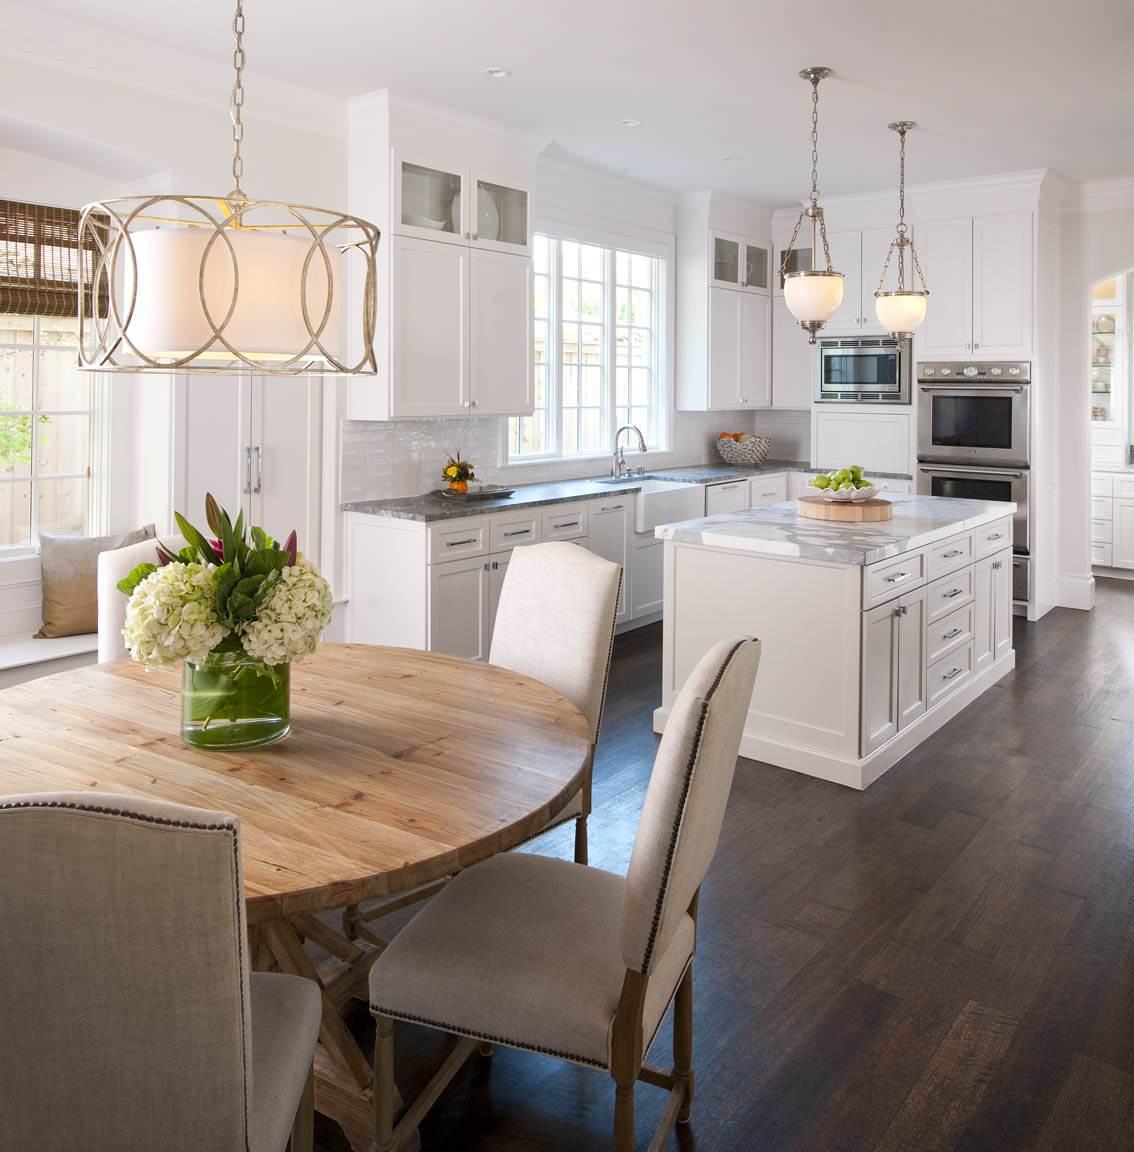 floor to ceiling white cabinet granite countertop wooden rounded dining table dark hardwood floor pendant lights